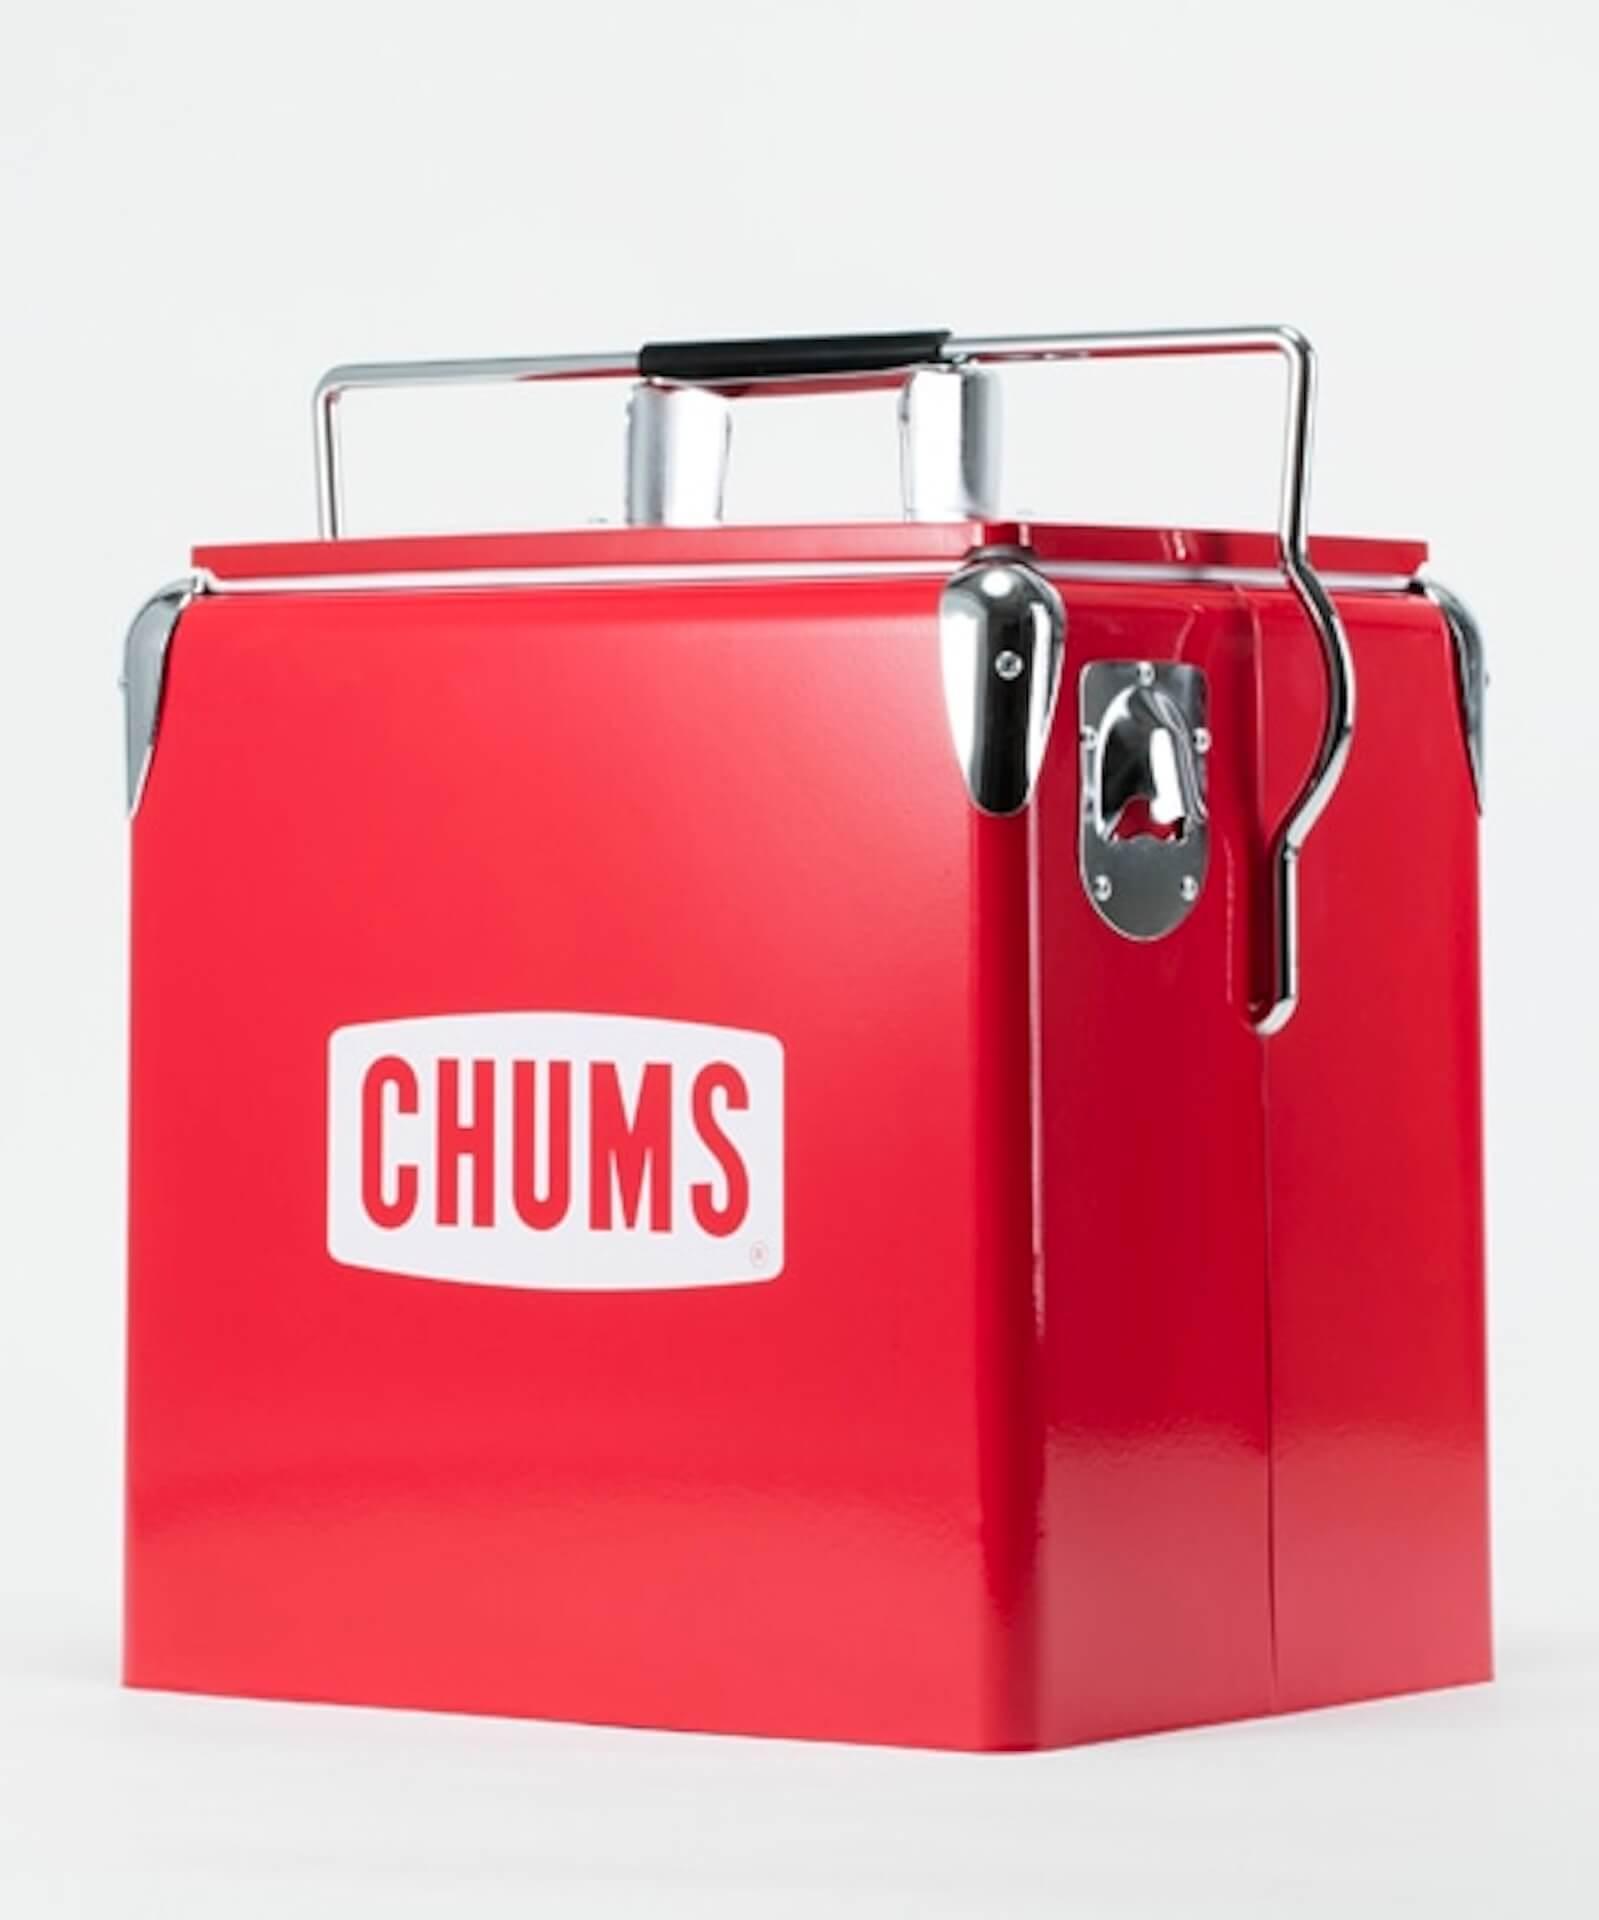 CHUMS仕様の完売コラボチェキが当たる!チェキとCHUMSの連動プレゼントキャンペーンがInstagramとTwitterで実施 ac200804_cheki_chums_02